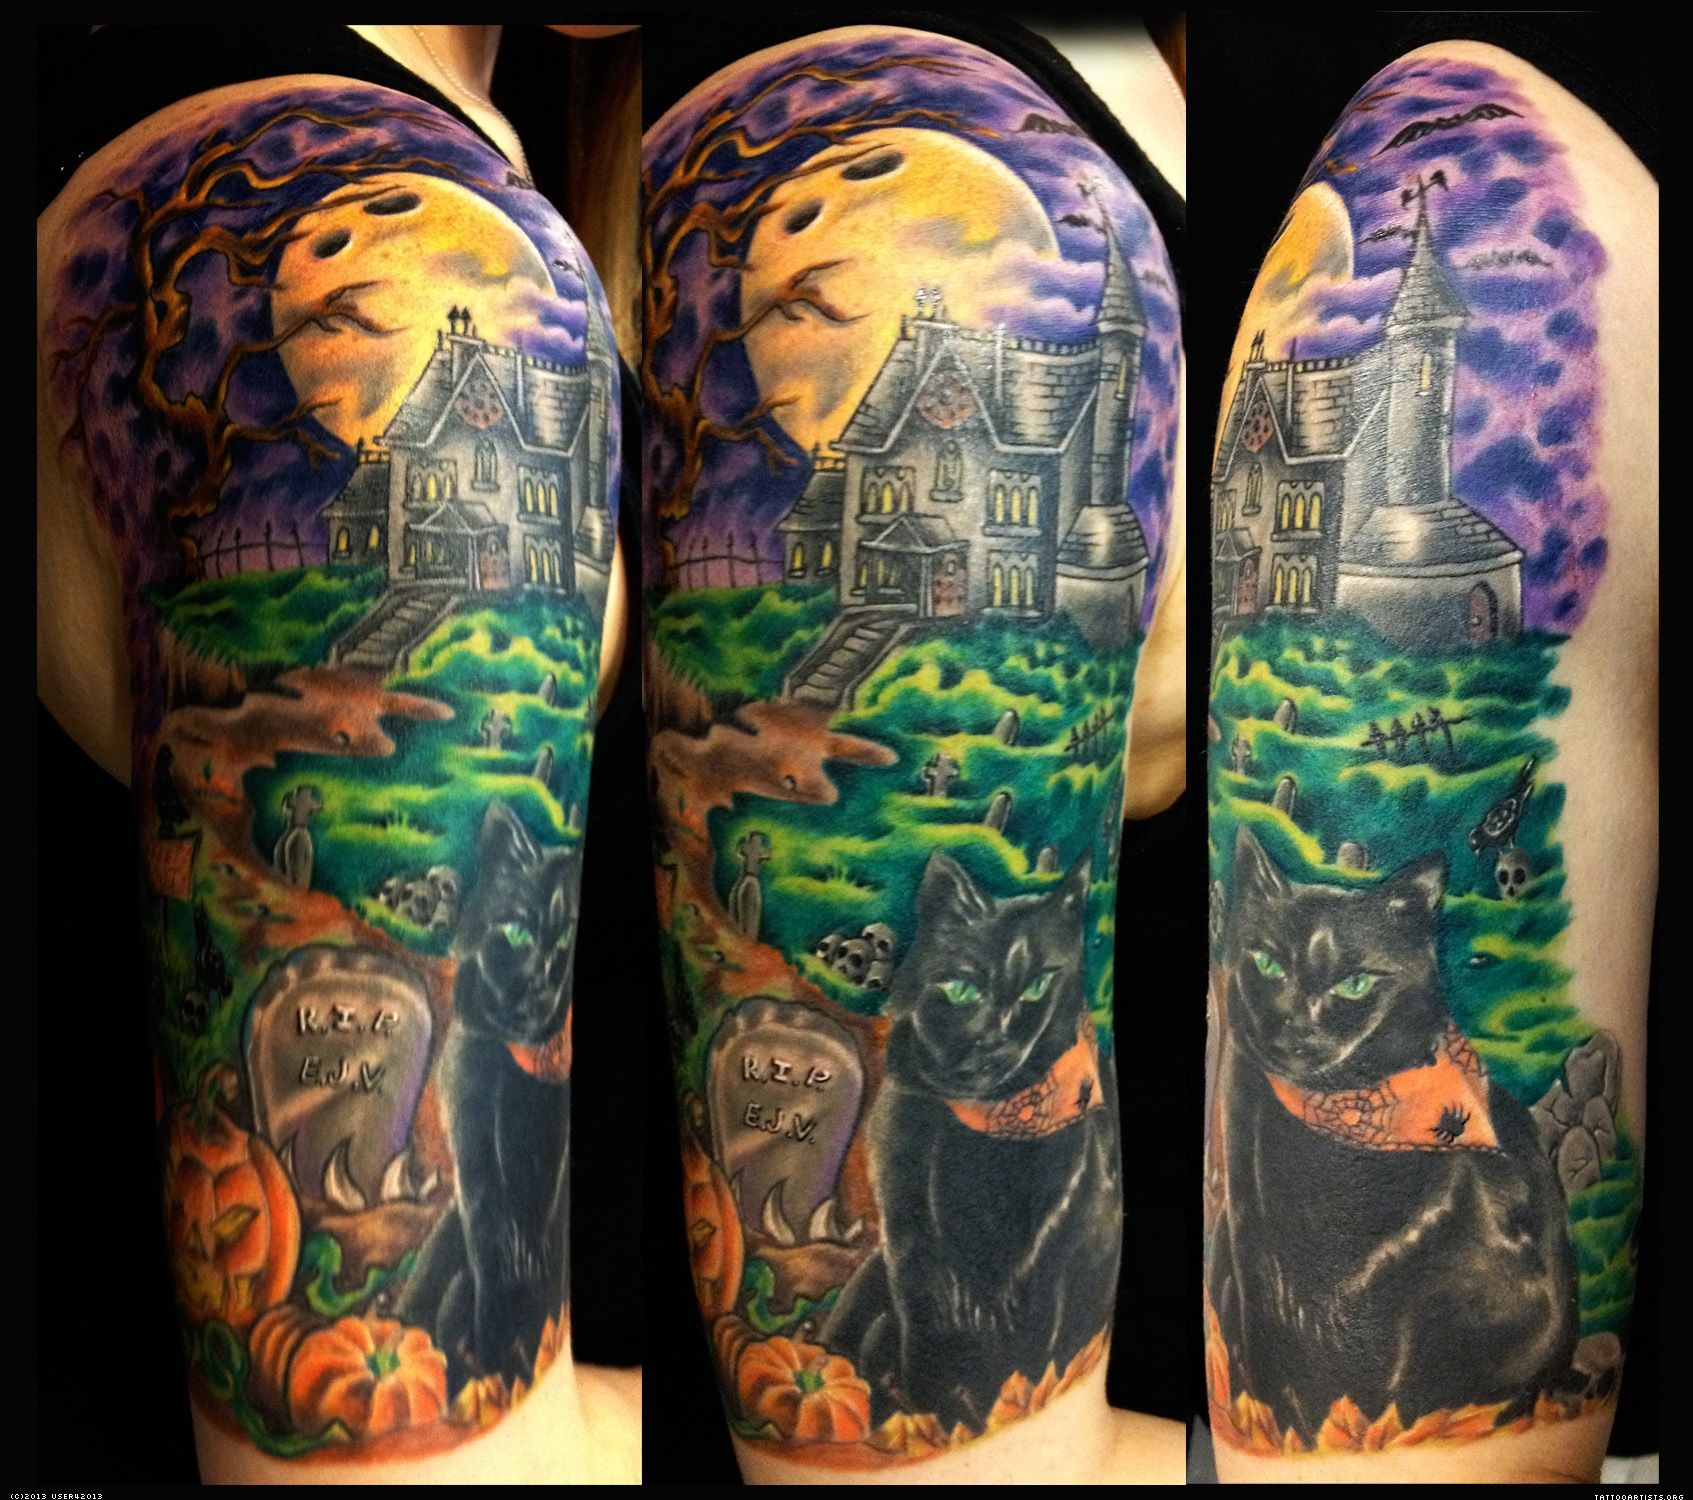 Tattoos.com | 14 Creepy & Cool Haunted House Tattoos! | Page 10 ...